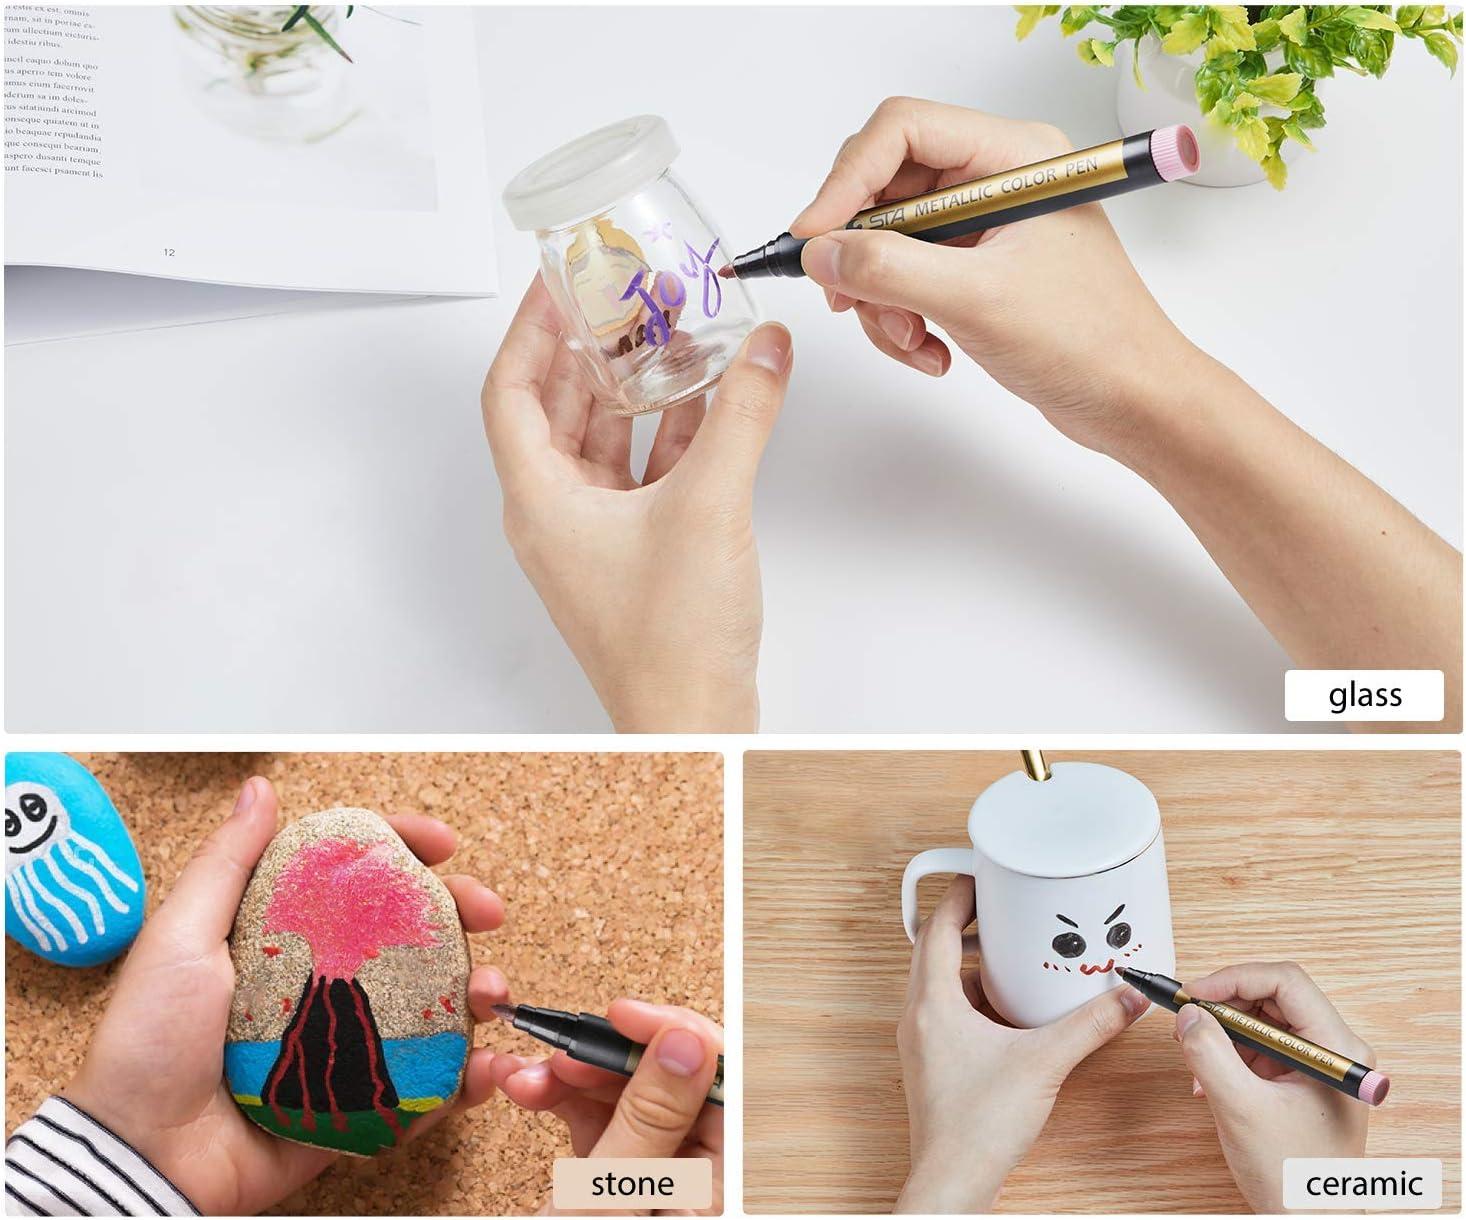 Premium Metallic Marker Pens Fine Tip Scrapbook Photo Album Glass Mothers Day Back To School Gifts Rock Art Coloring Books Ohuhu Set of 10 Glitter Paint Pen Window Marker for DIY Card Making